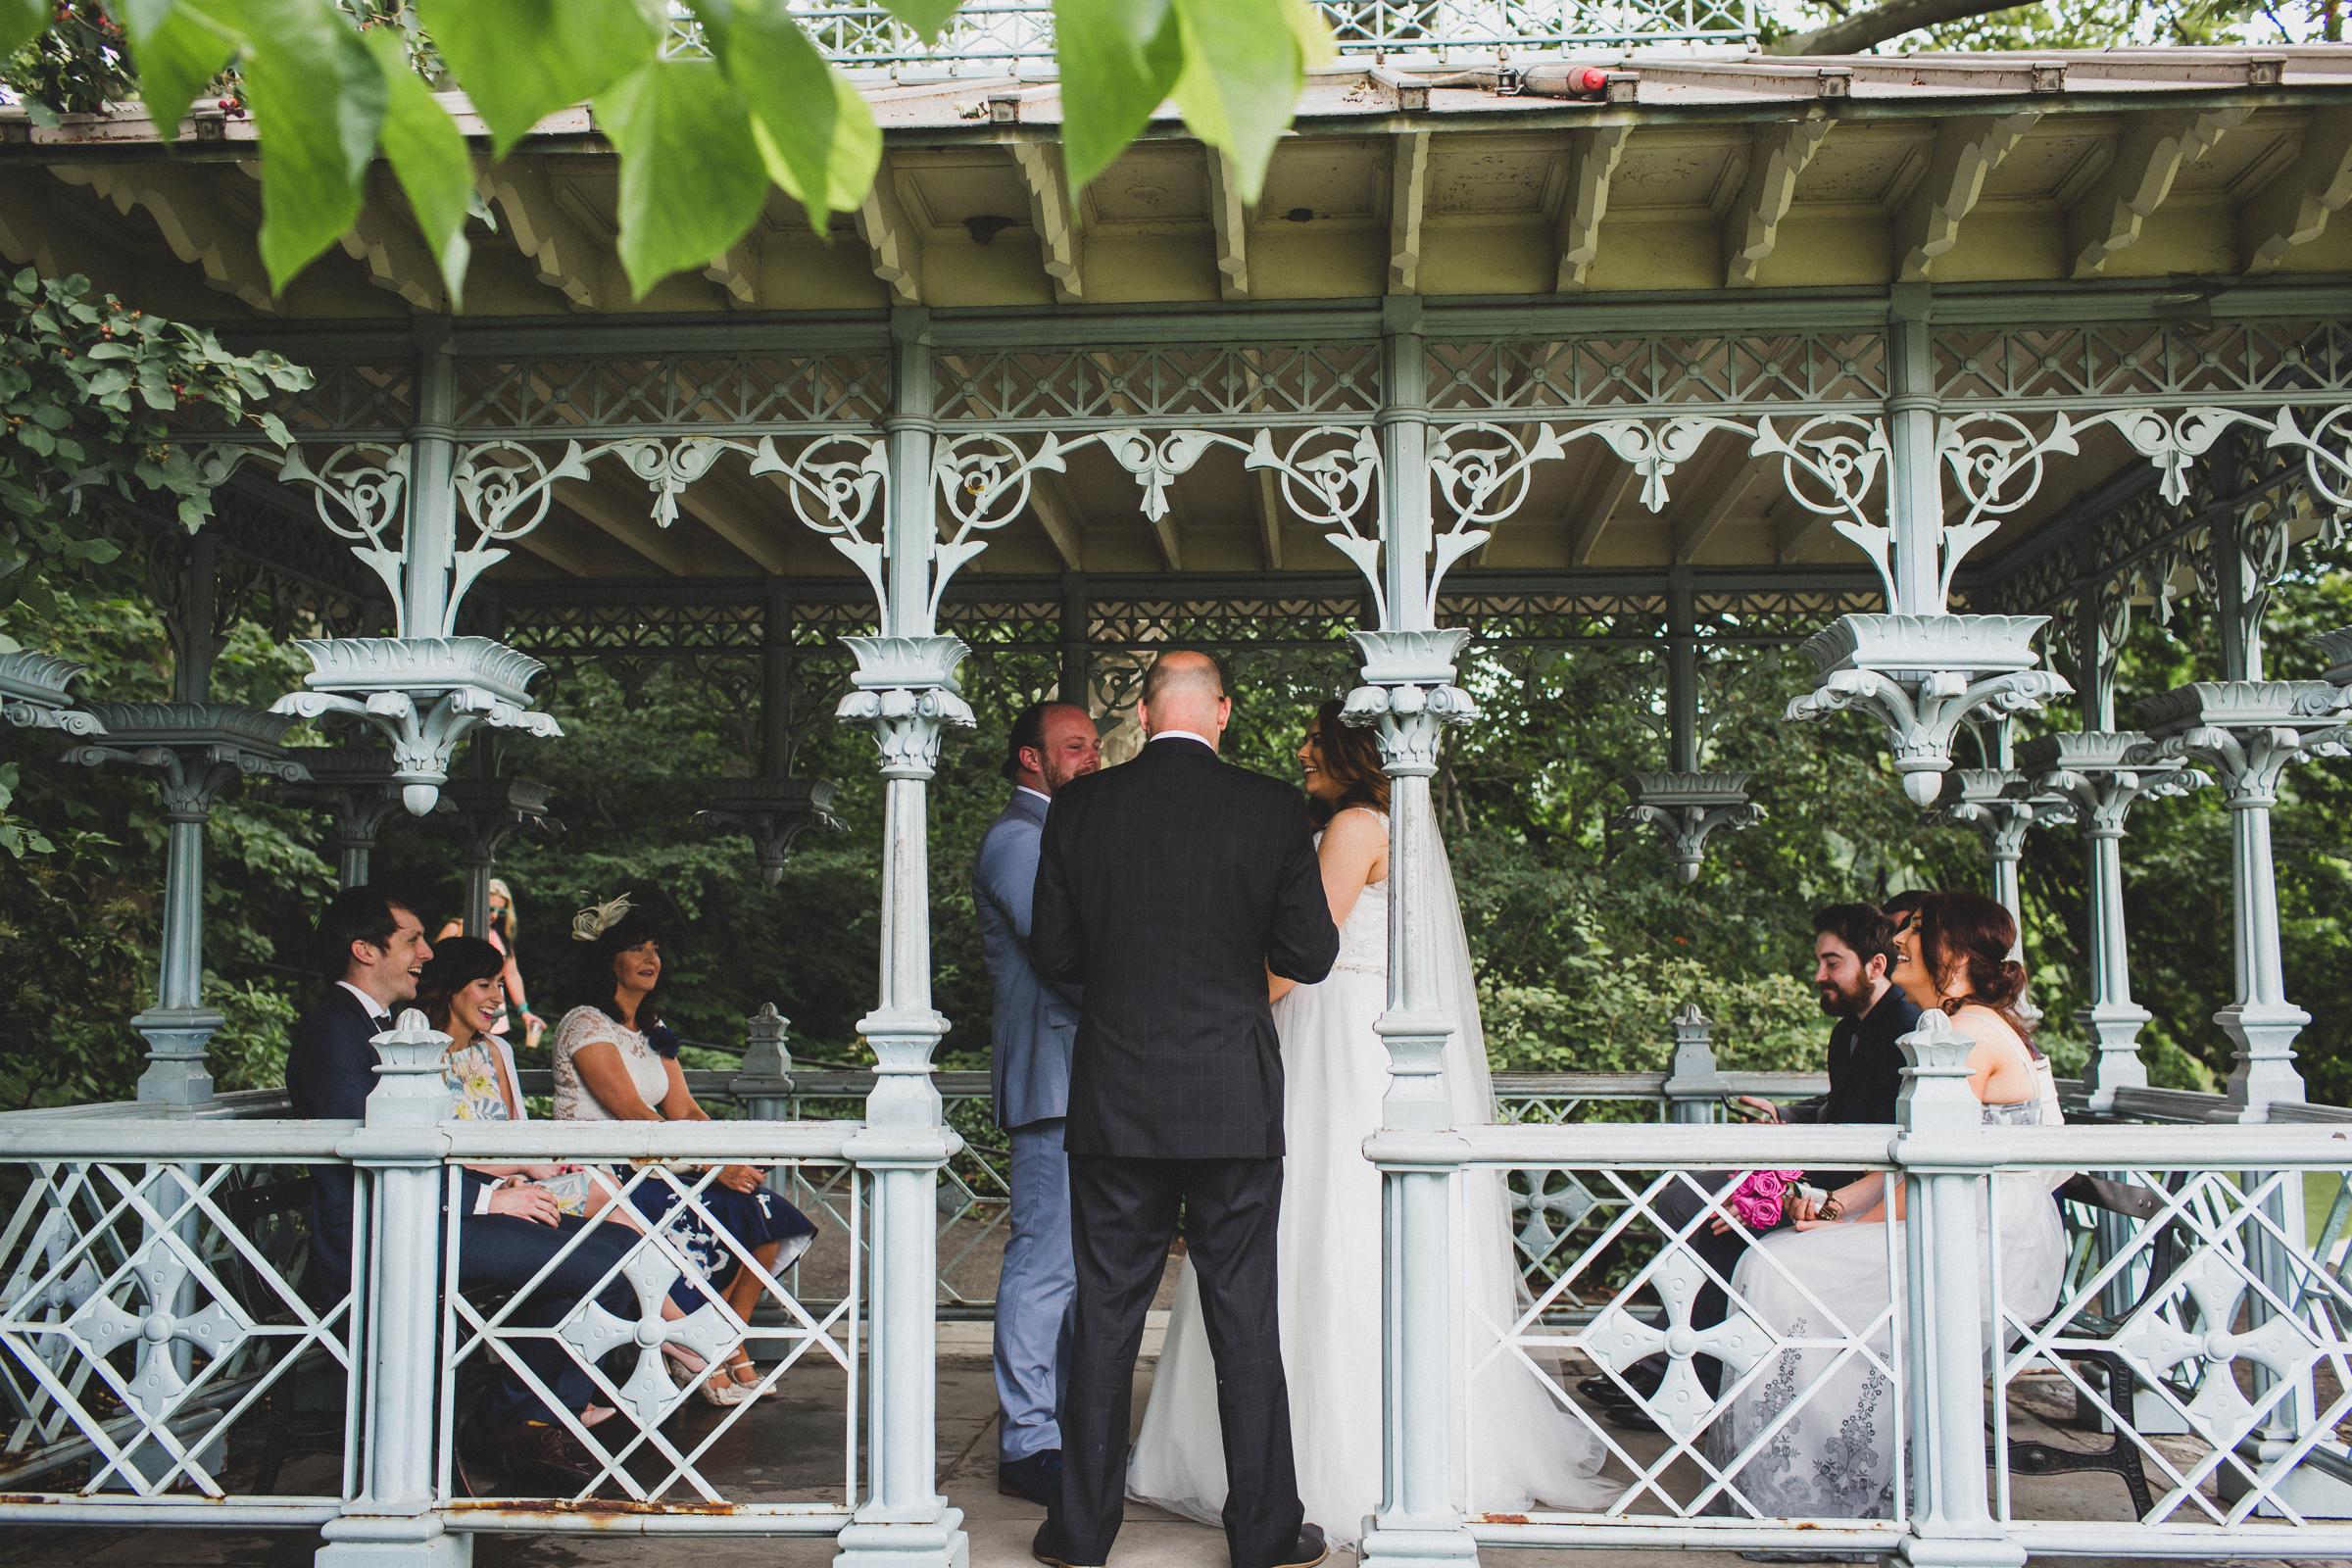 NYC-Central-Park-Elopement-New-York-Documentary-Wedding-Photographer-Dumbo-Brooklyn-Bridge-Park--14.jpg